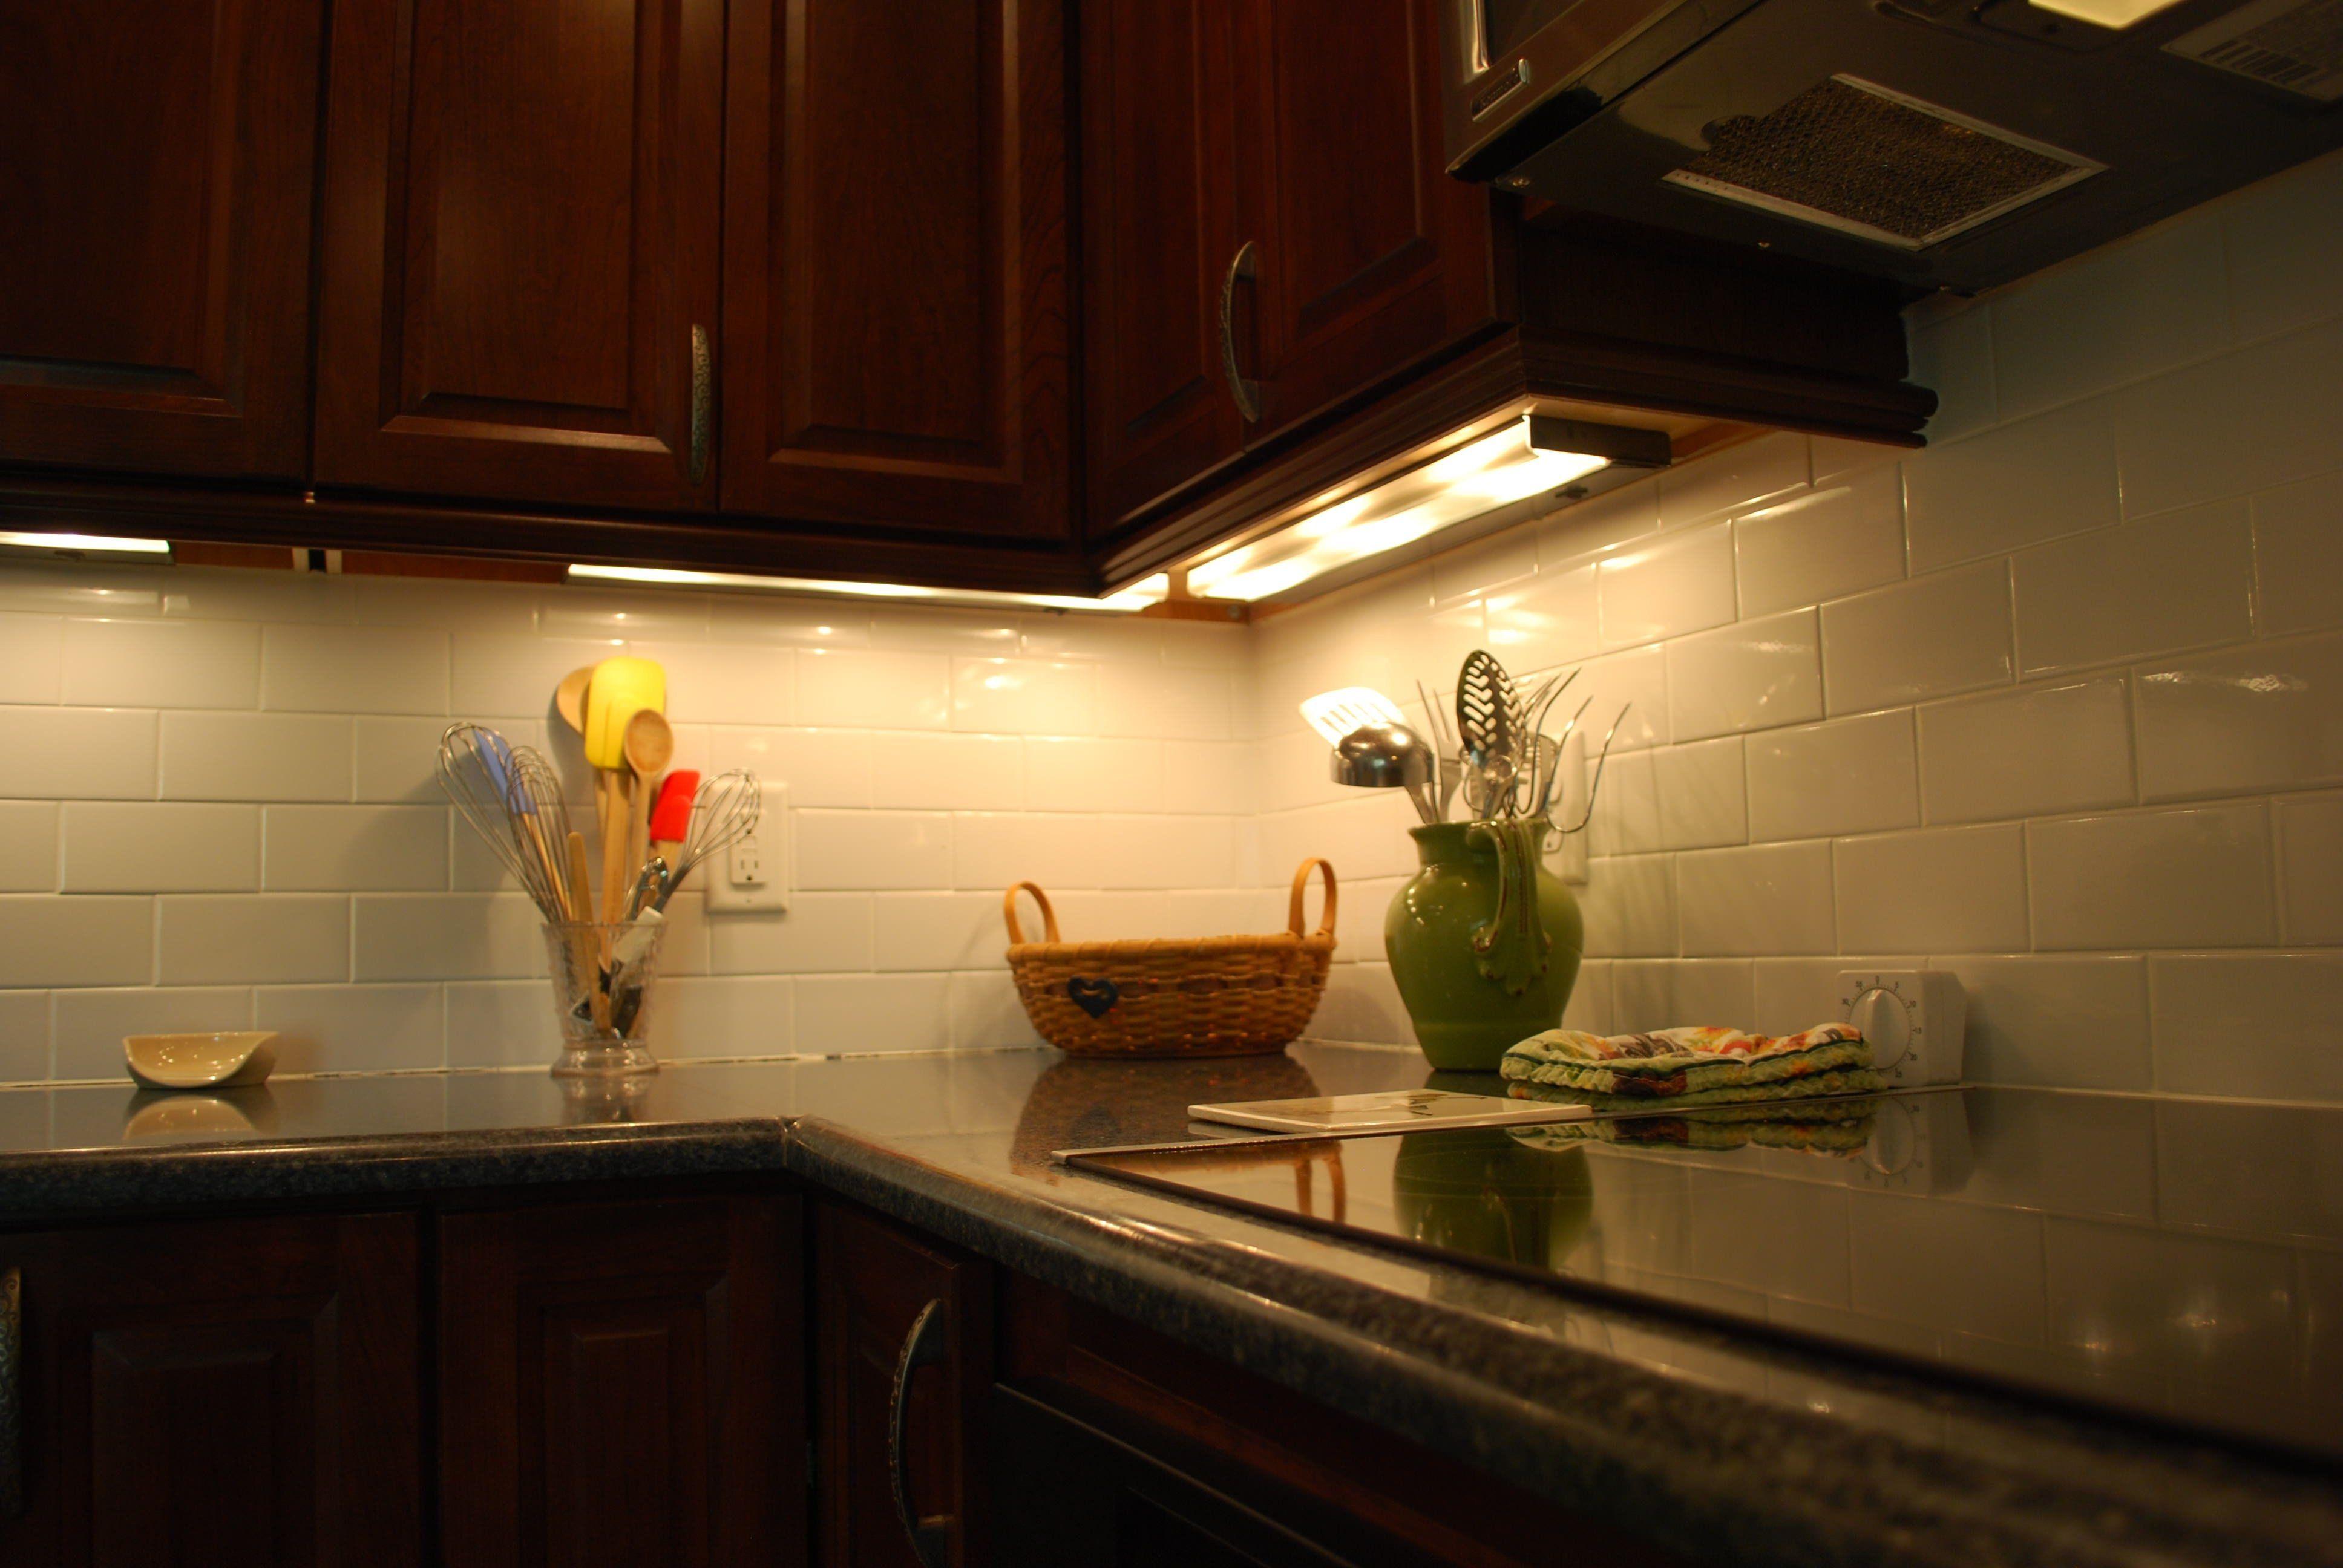 Image Of Best Under Cabinet Lighting Decor Trends The Superb Under Regarding Best Under Cabinet Lighting Light Kitchen Cabinets Kitchen Under Cabinet Lighting